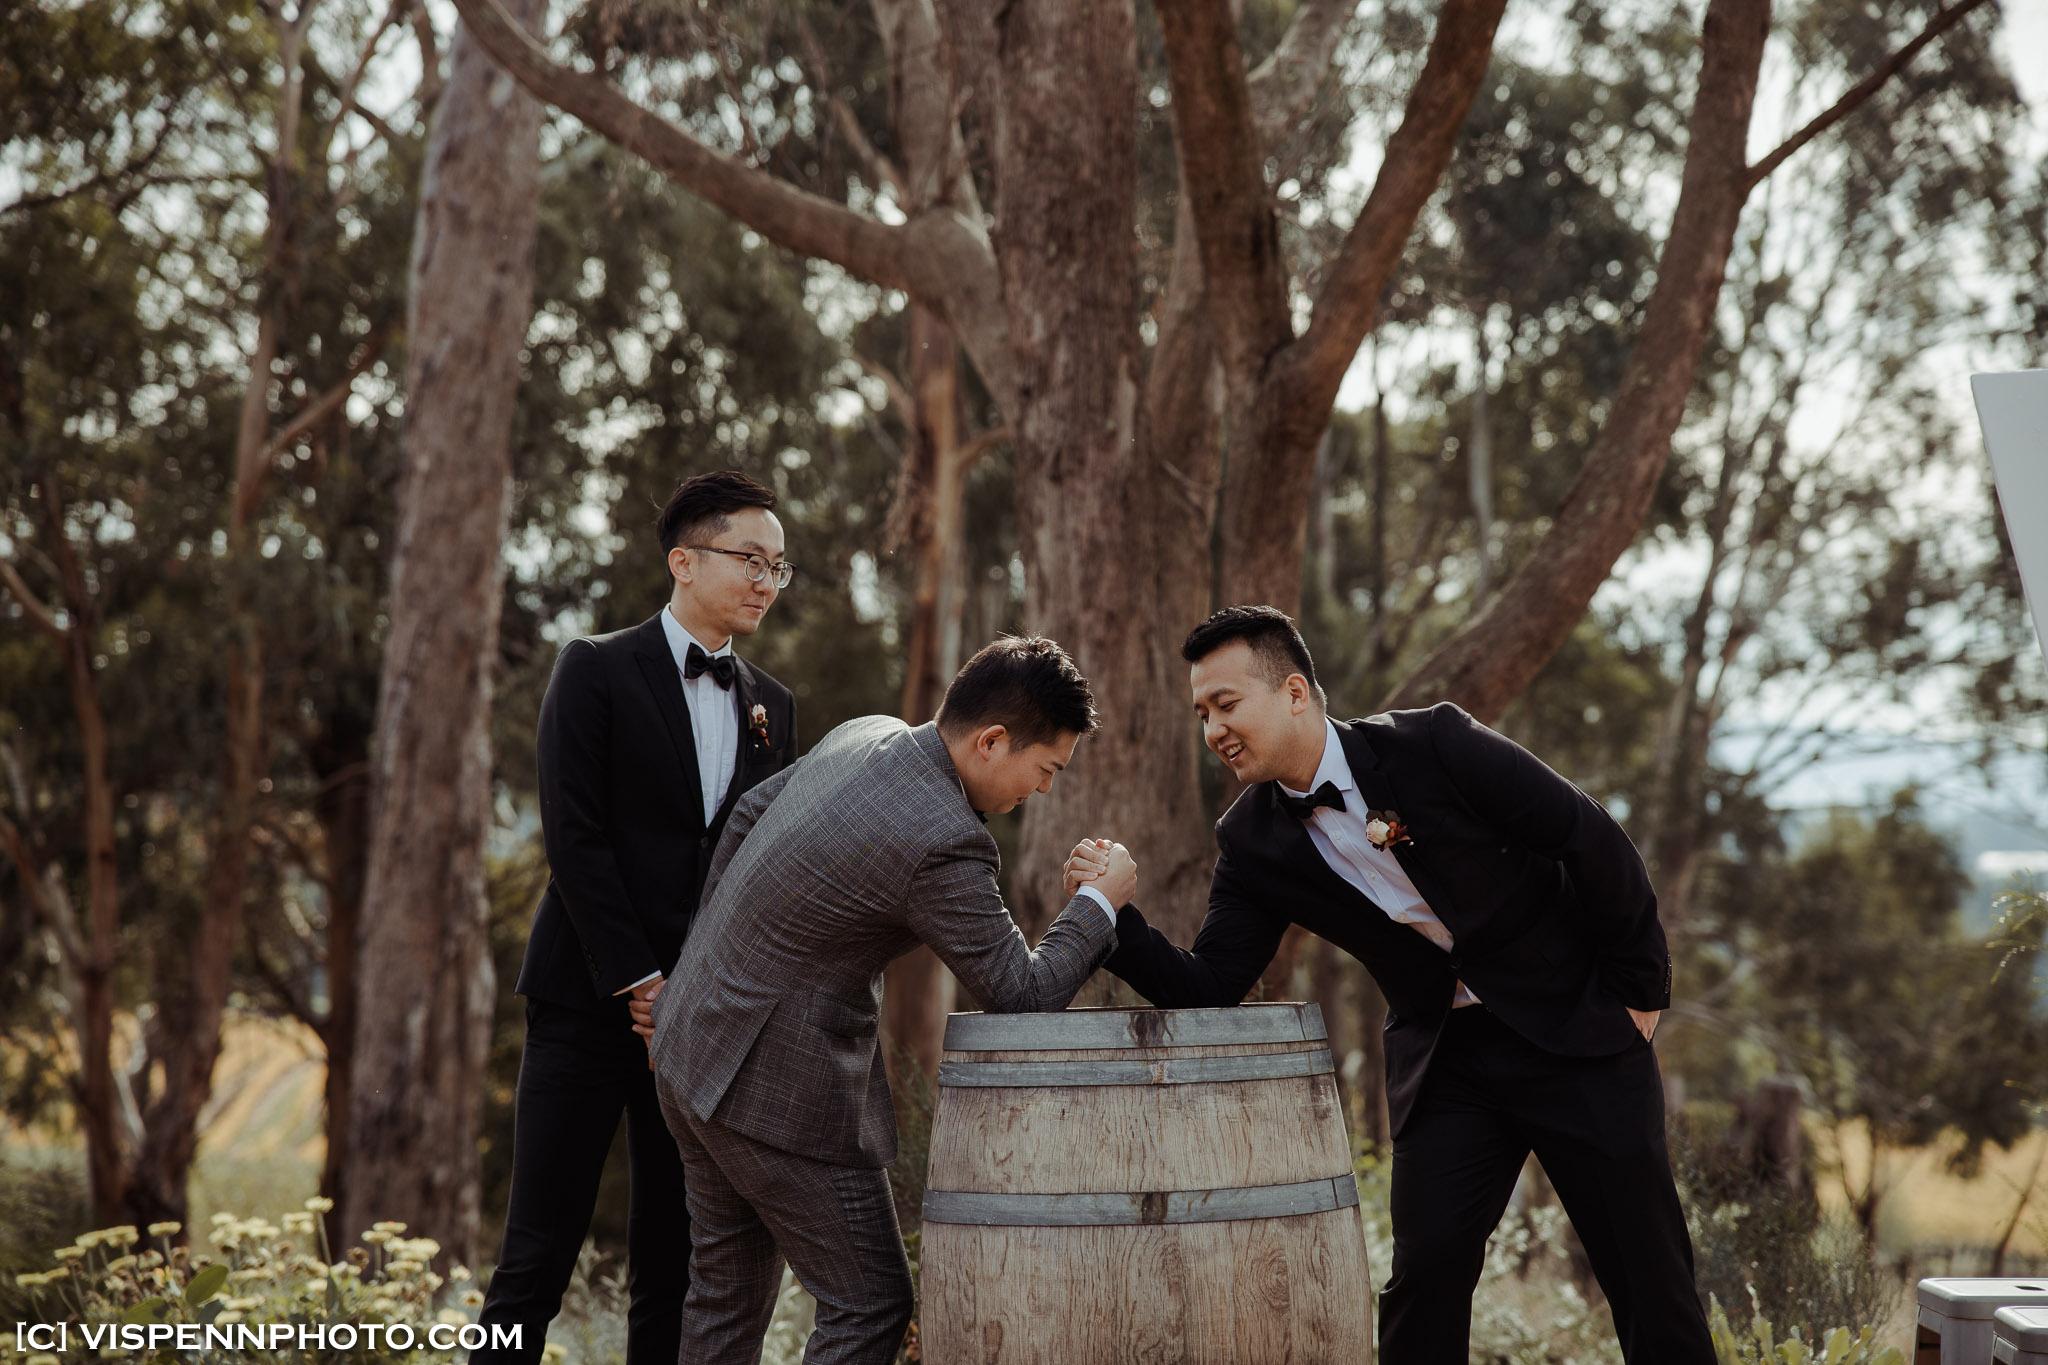 WEDDING DAY Photography Melbourne VISPENN 墨尔本 婚礼跟拍 婚礼摄像 婚礼摄影 结婚照 登记照 DominicHelen 1P 1996 EOSR VISPENN